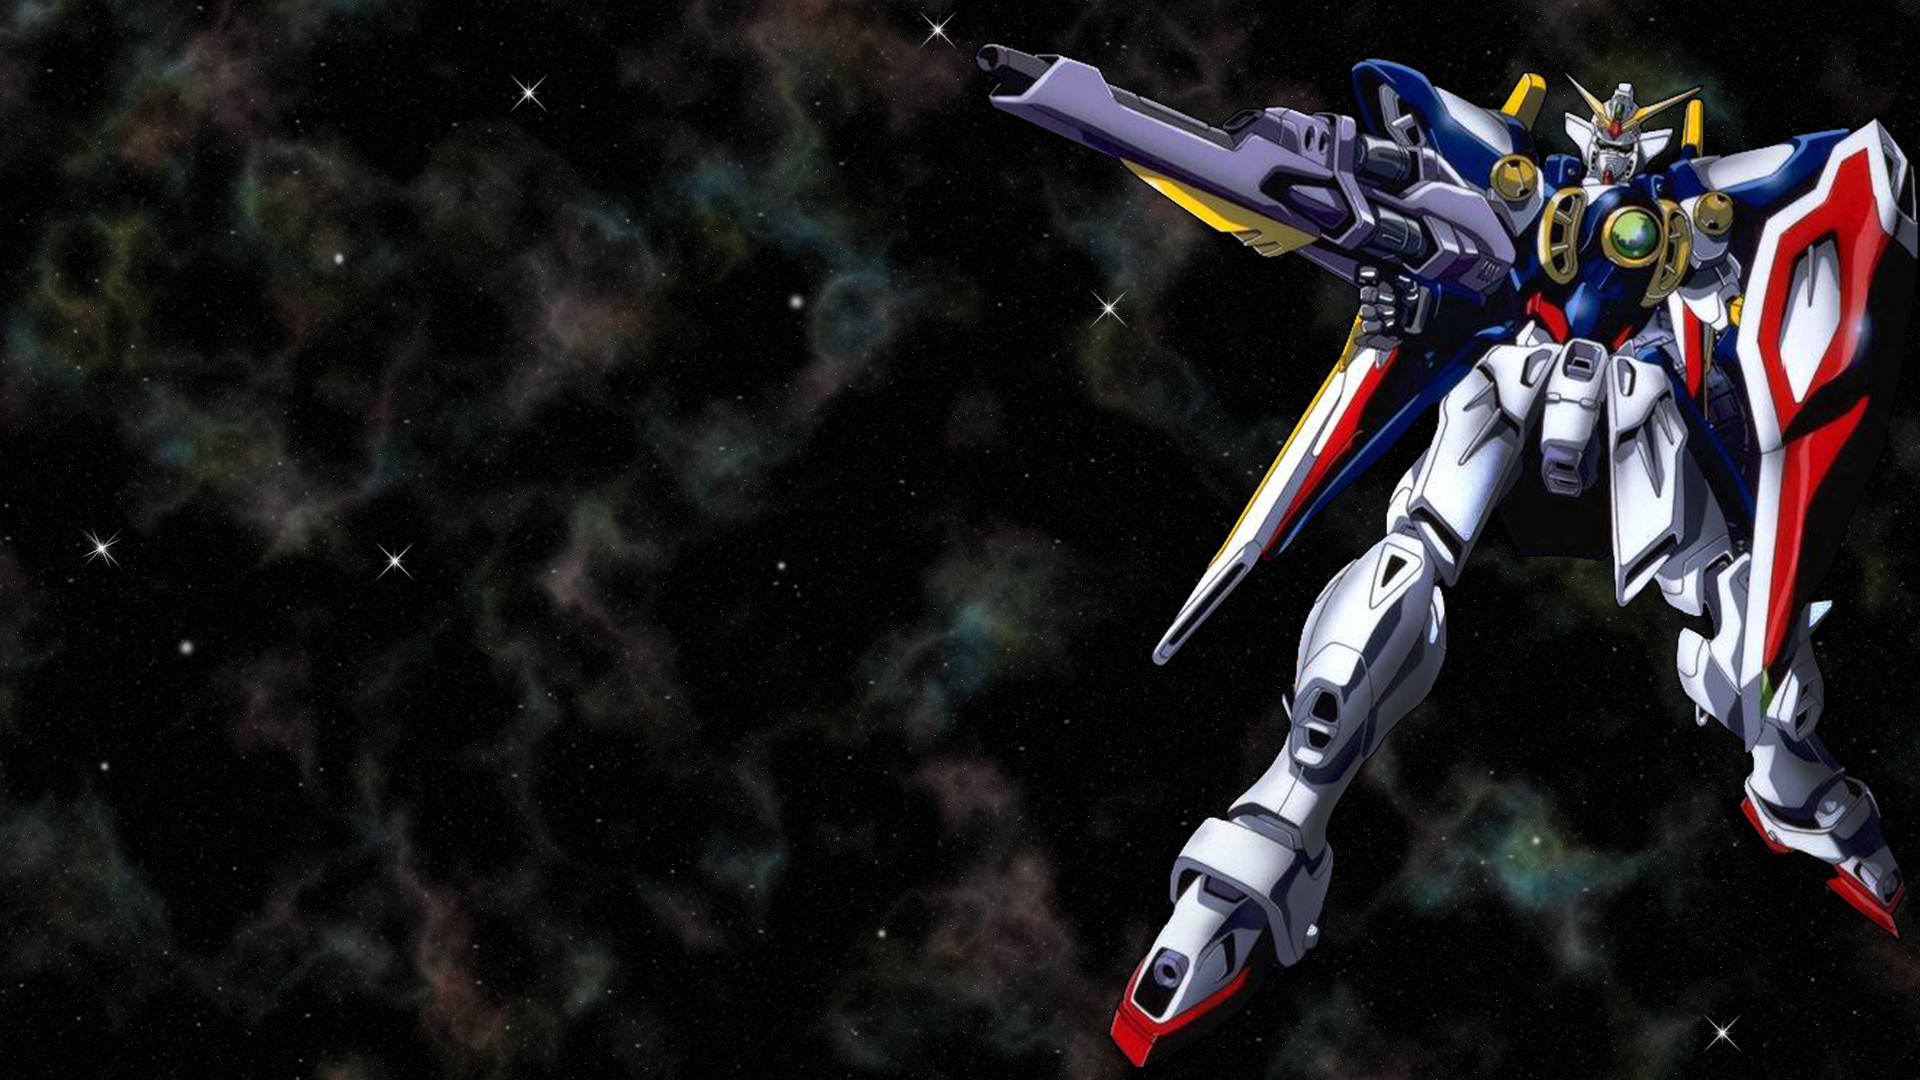 Gundam hd 611706 wallpaper wallpaper cartoon gundam hd 611706 wallpaper wallpaper voltagebd Images